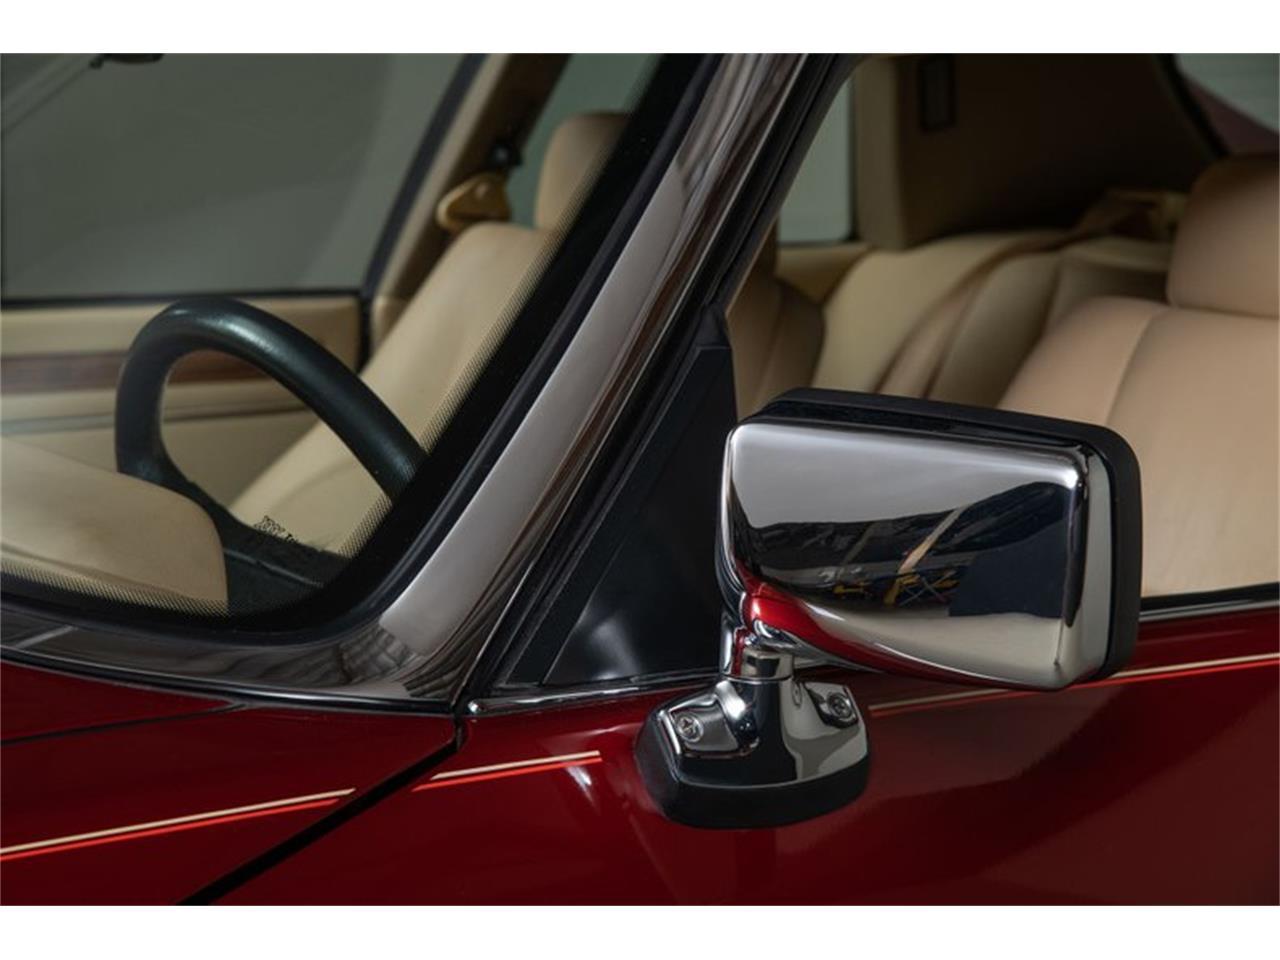 1992 Jaguar XJS (CC-1246320) for sale in Scotts Valley, California